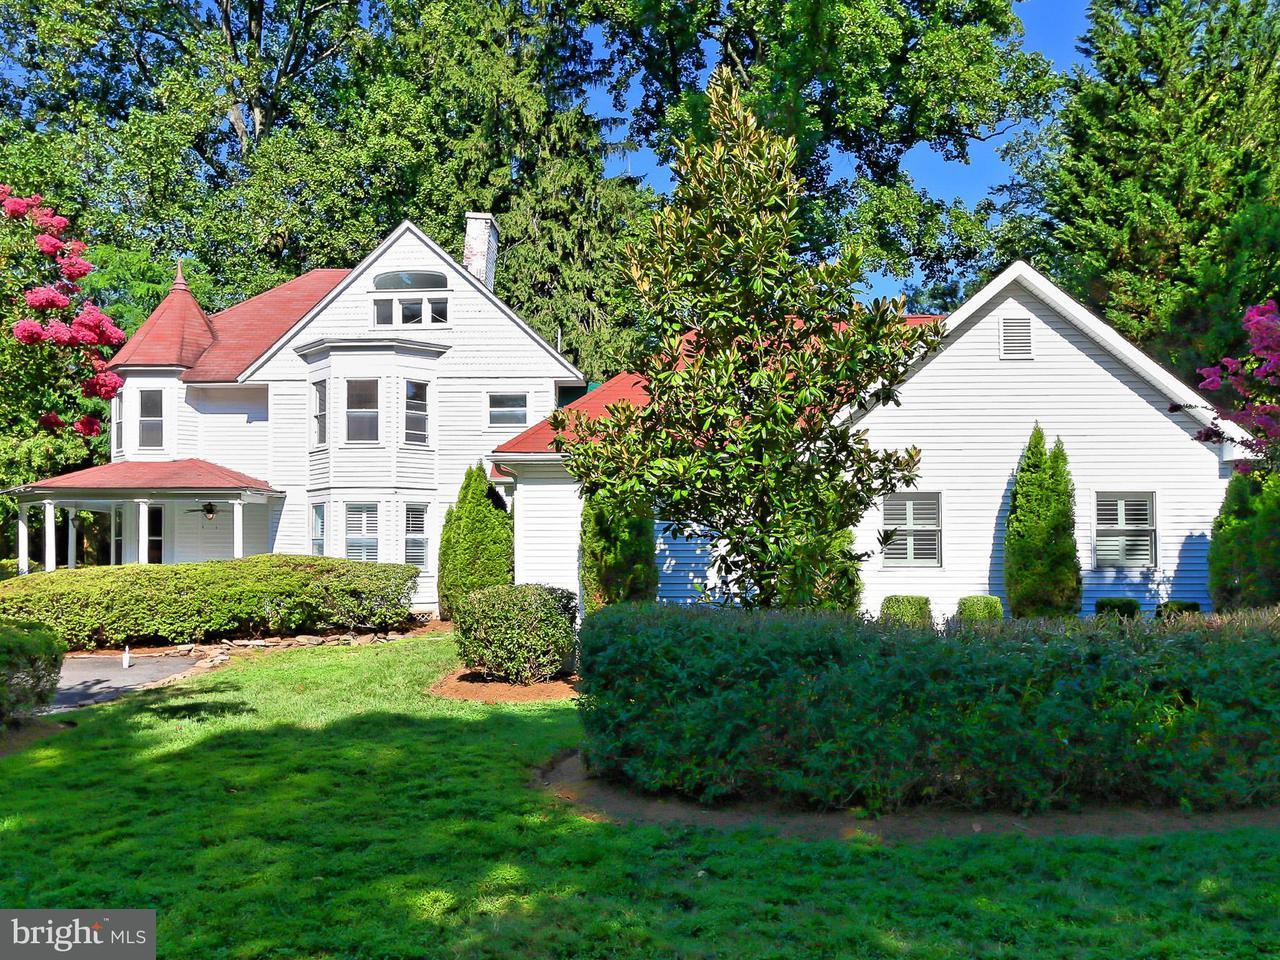 Single Family for Sale at 2420 Sandburg St Dunn Loring, Virginia 22027 United States